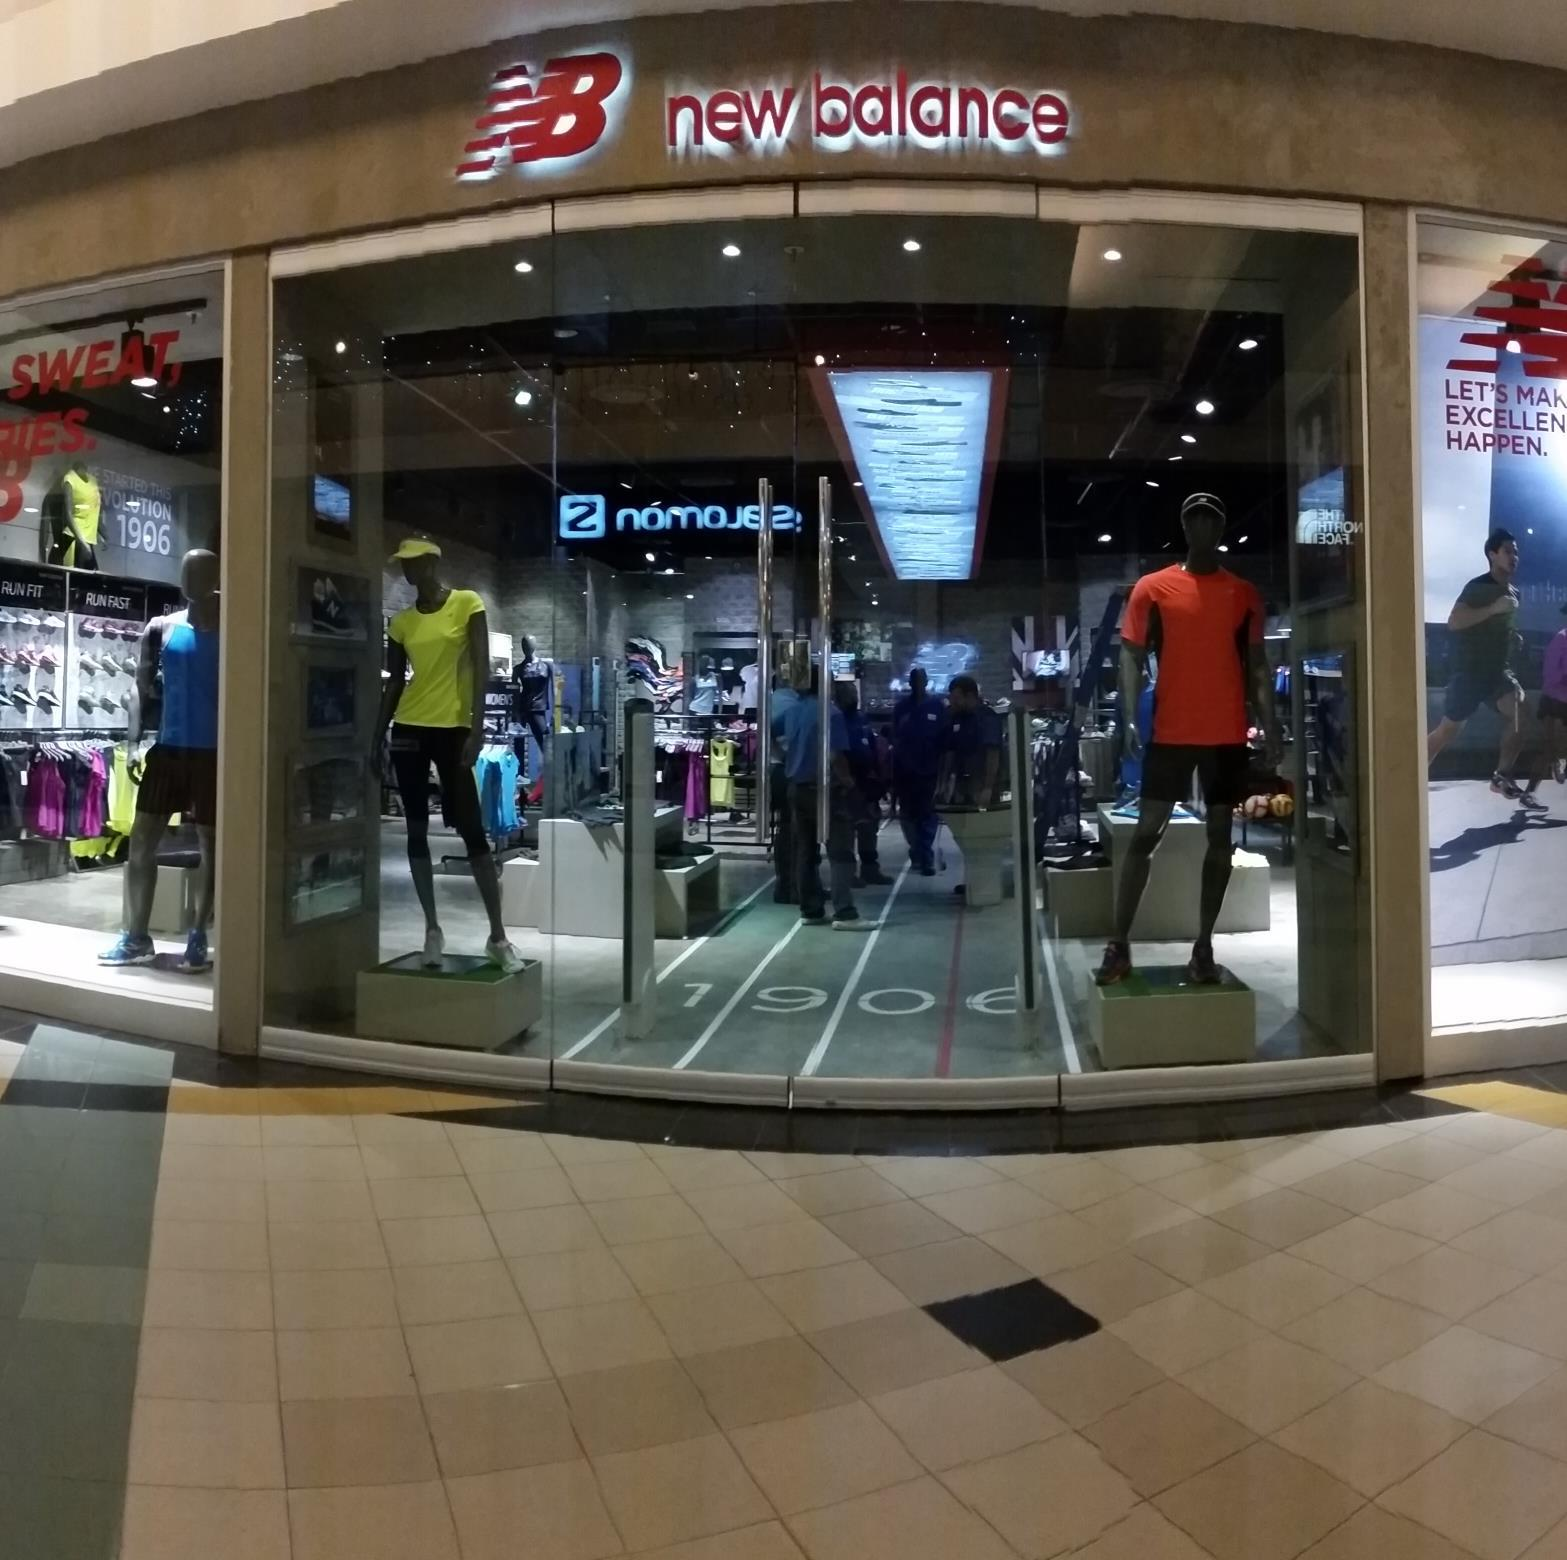 new balance menlyn mall Shop Clothing